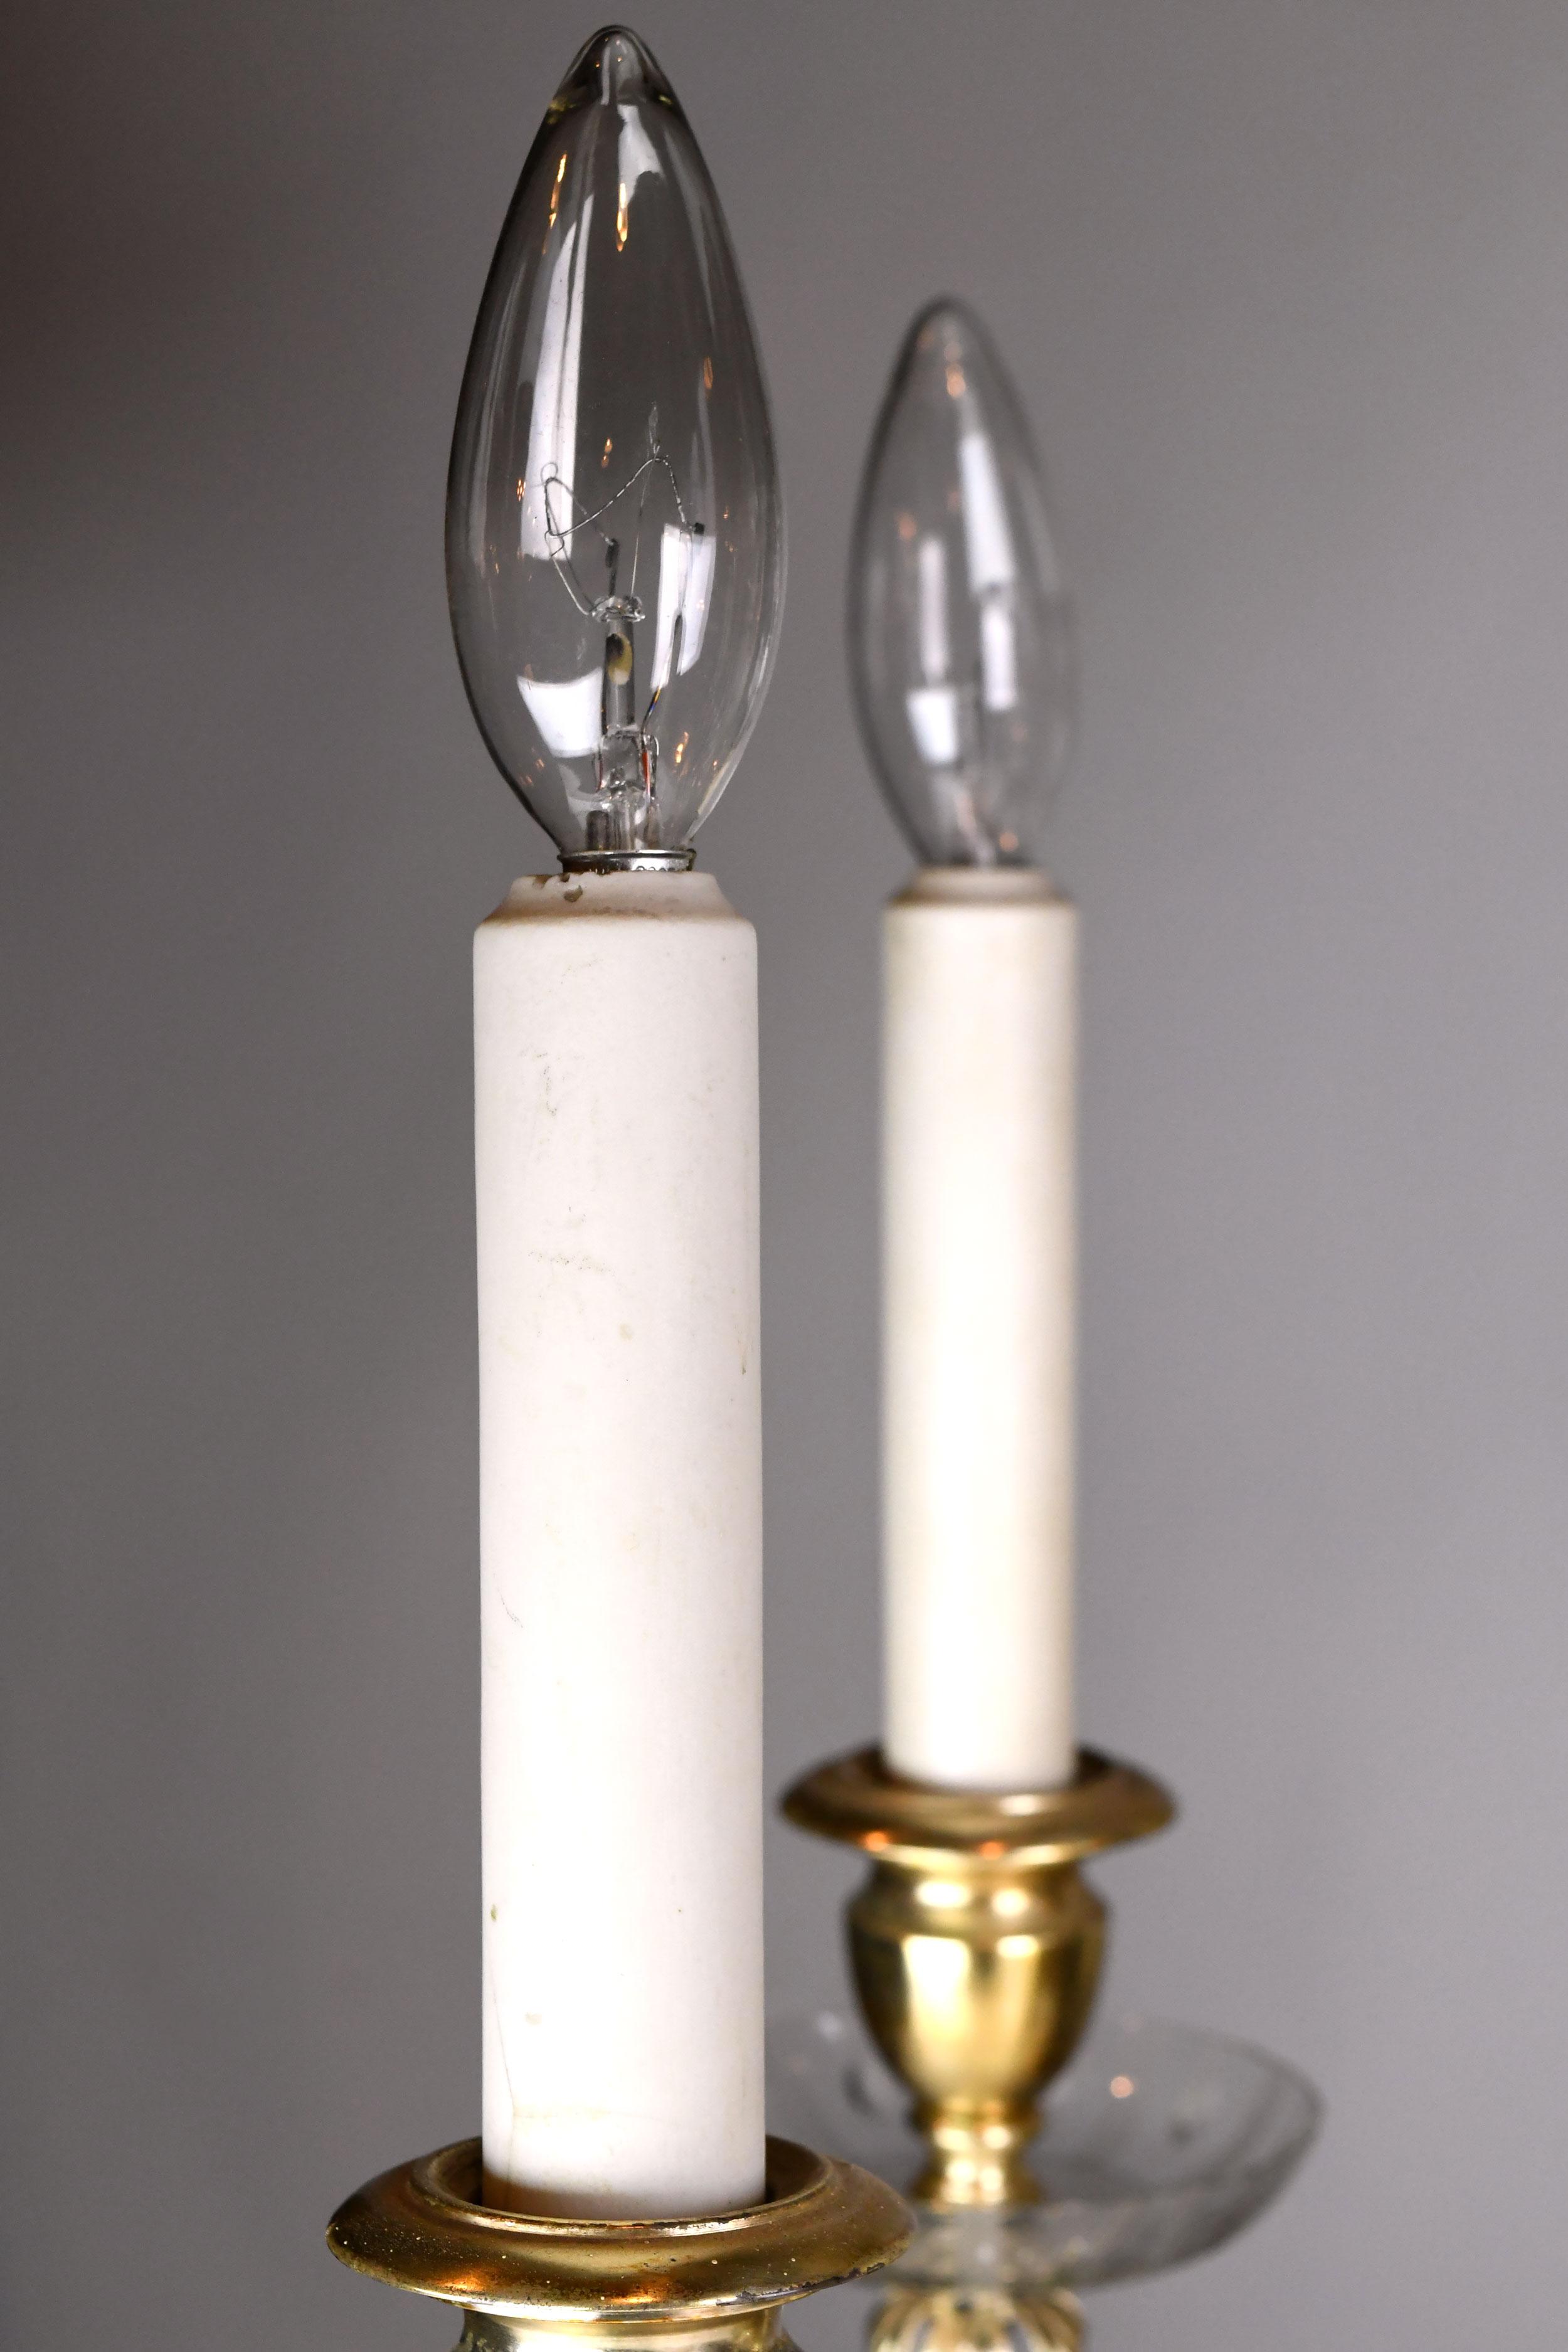 47326-bradley-hubbard-six-arm-chandelier-candle-cover.jpg